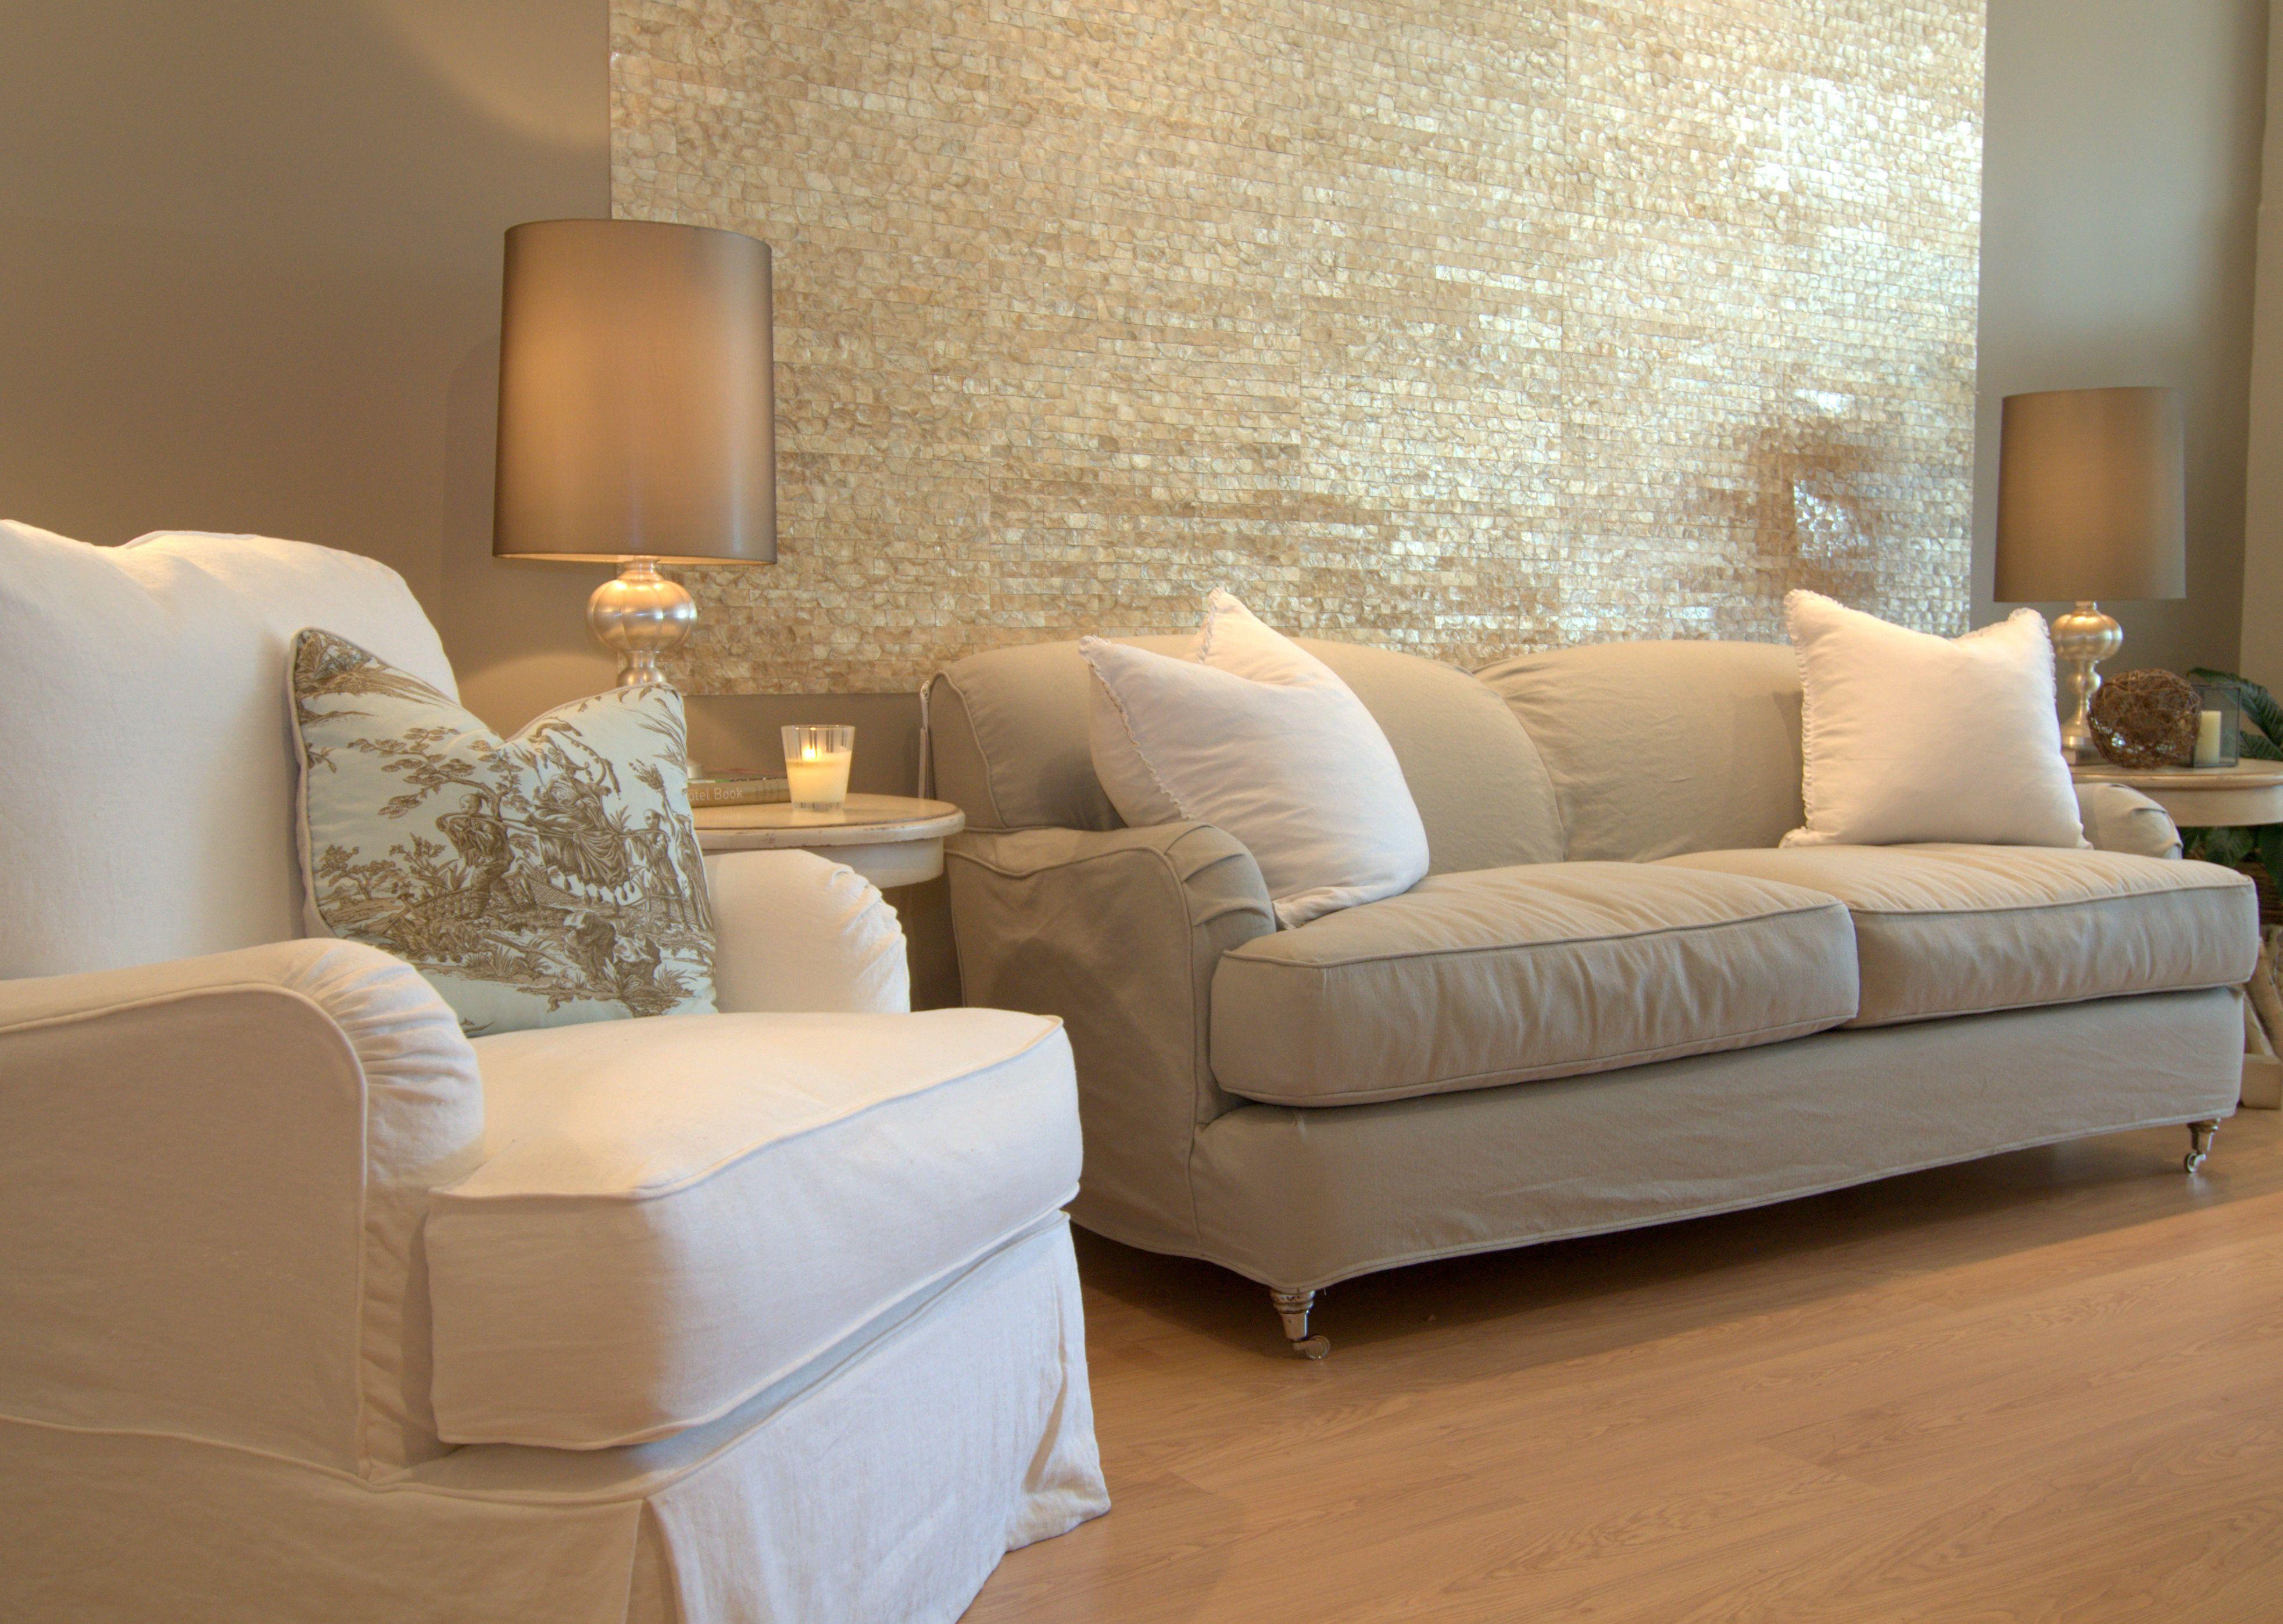 Captivating Quatrine   Birmingham. London Sofa And Milan Chair